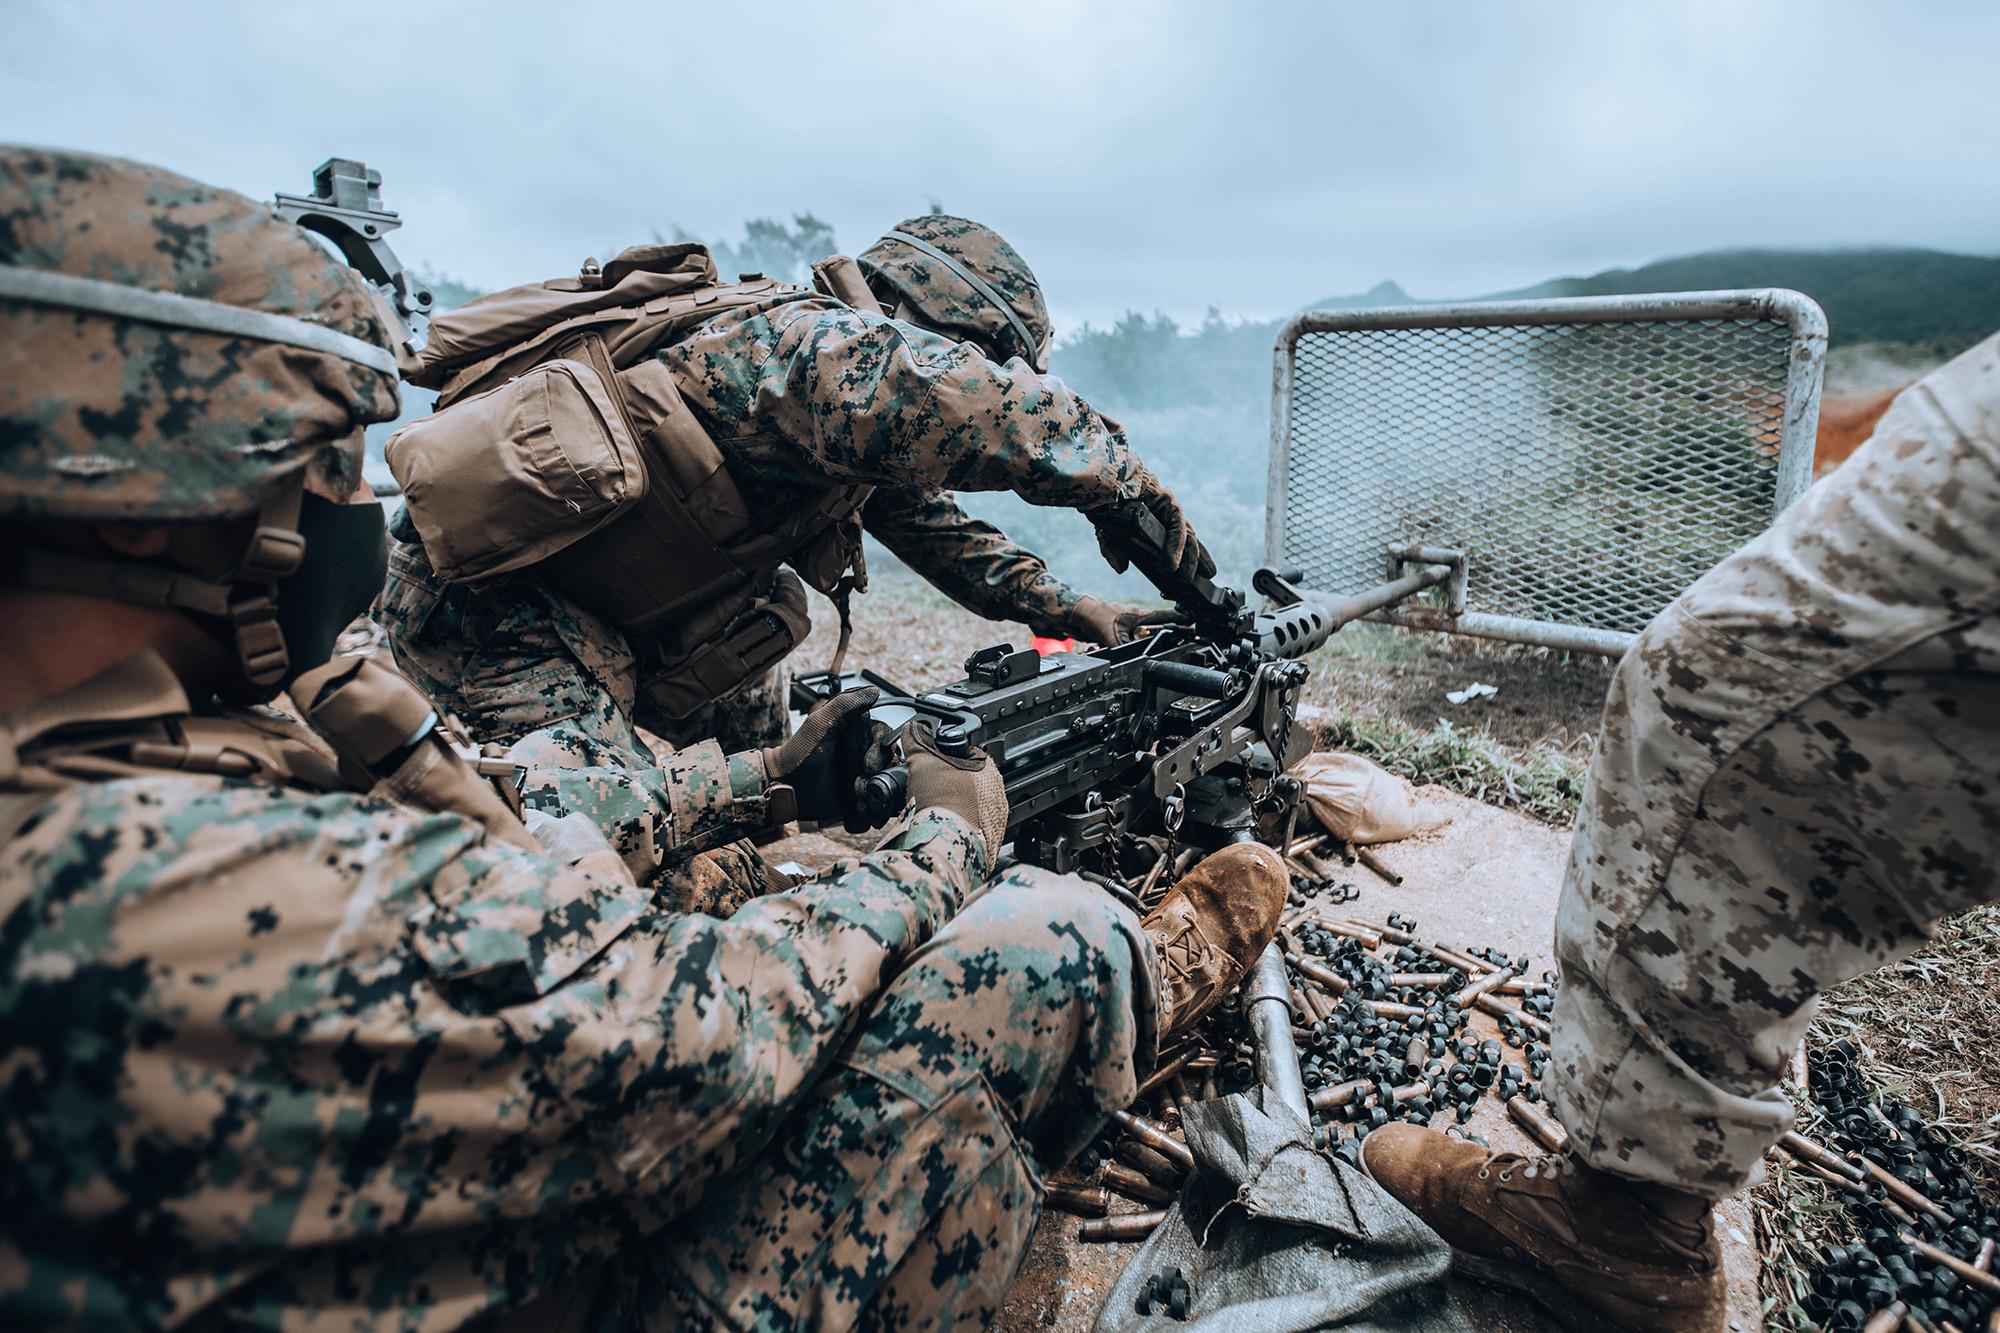 U.S. Marines fire an M2 .50 caliber machine gun on Camp Hansen, Okinawa, Japan, Aug. 26, 2020. (Lance Cpl. Jackson Dukes/Marine Corps)